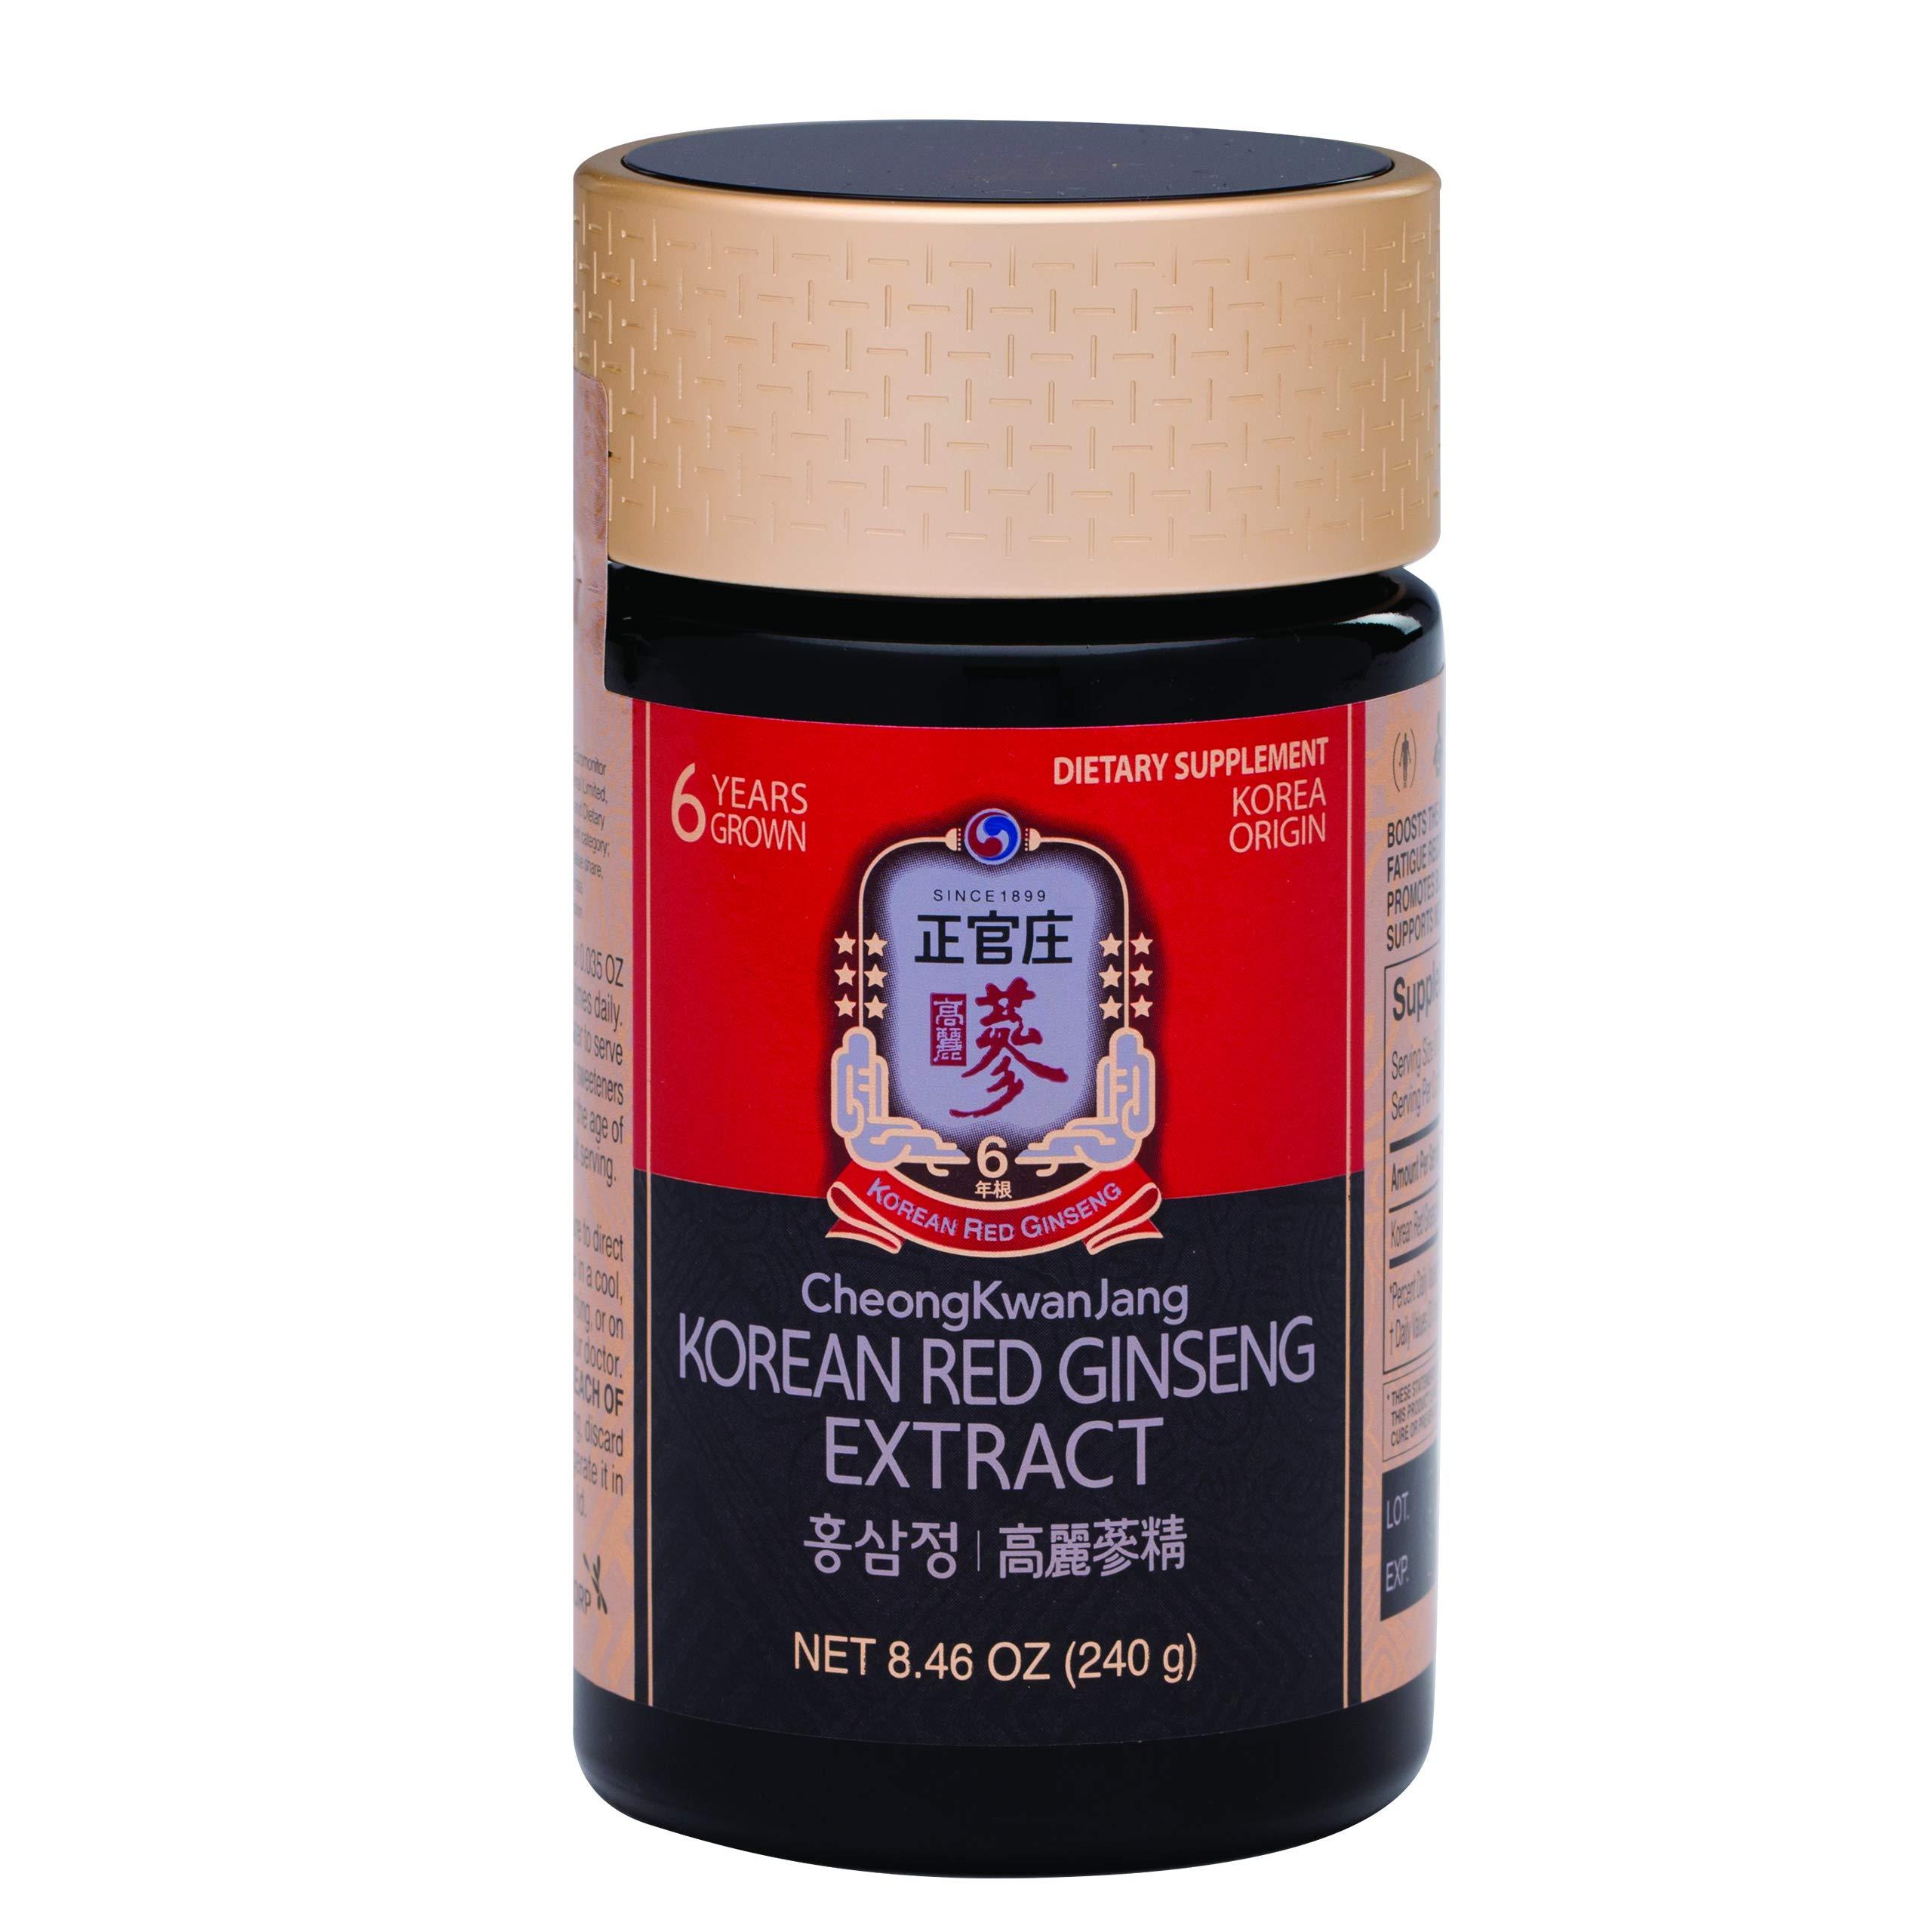 KGC Cheong Kwan Jang [Korean Red Ginseng Extract] For Extra